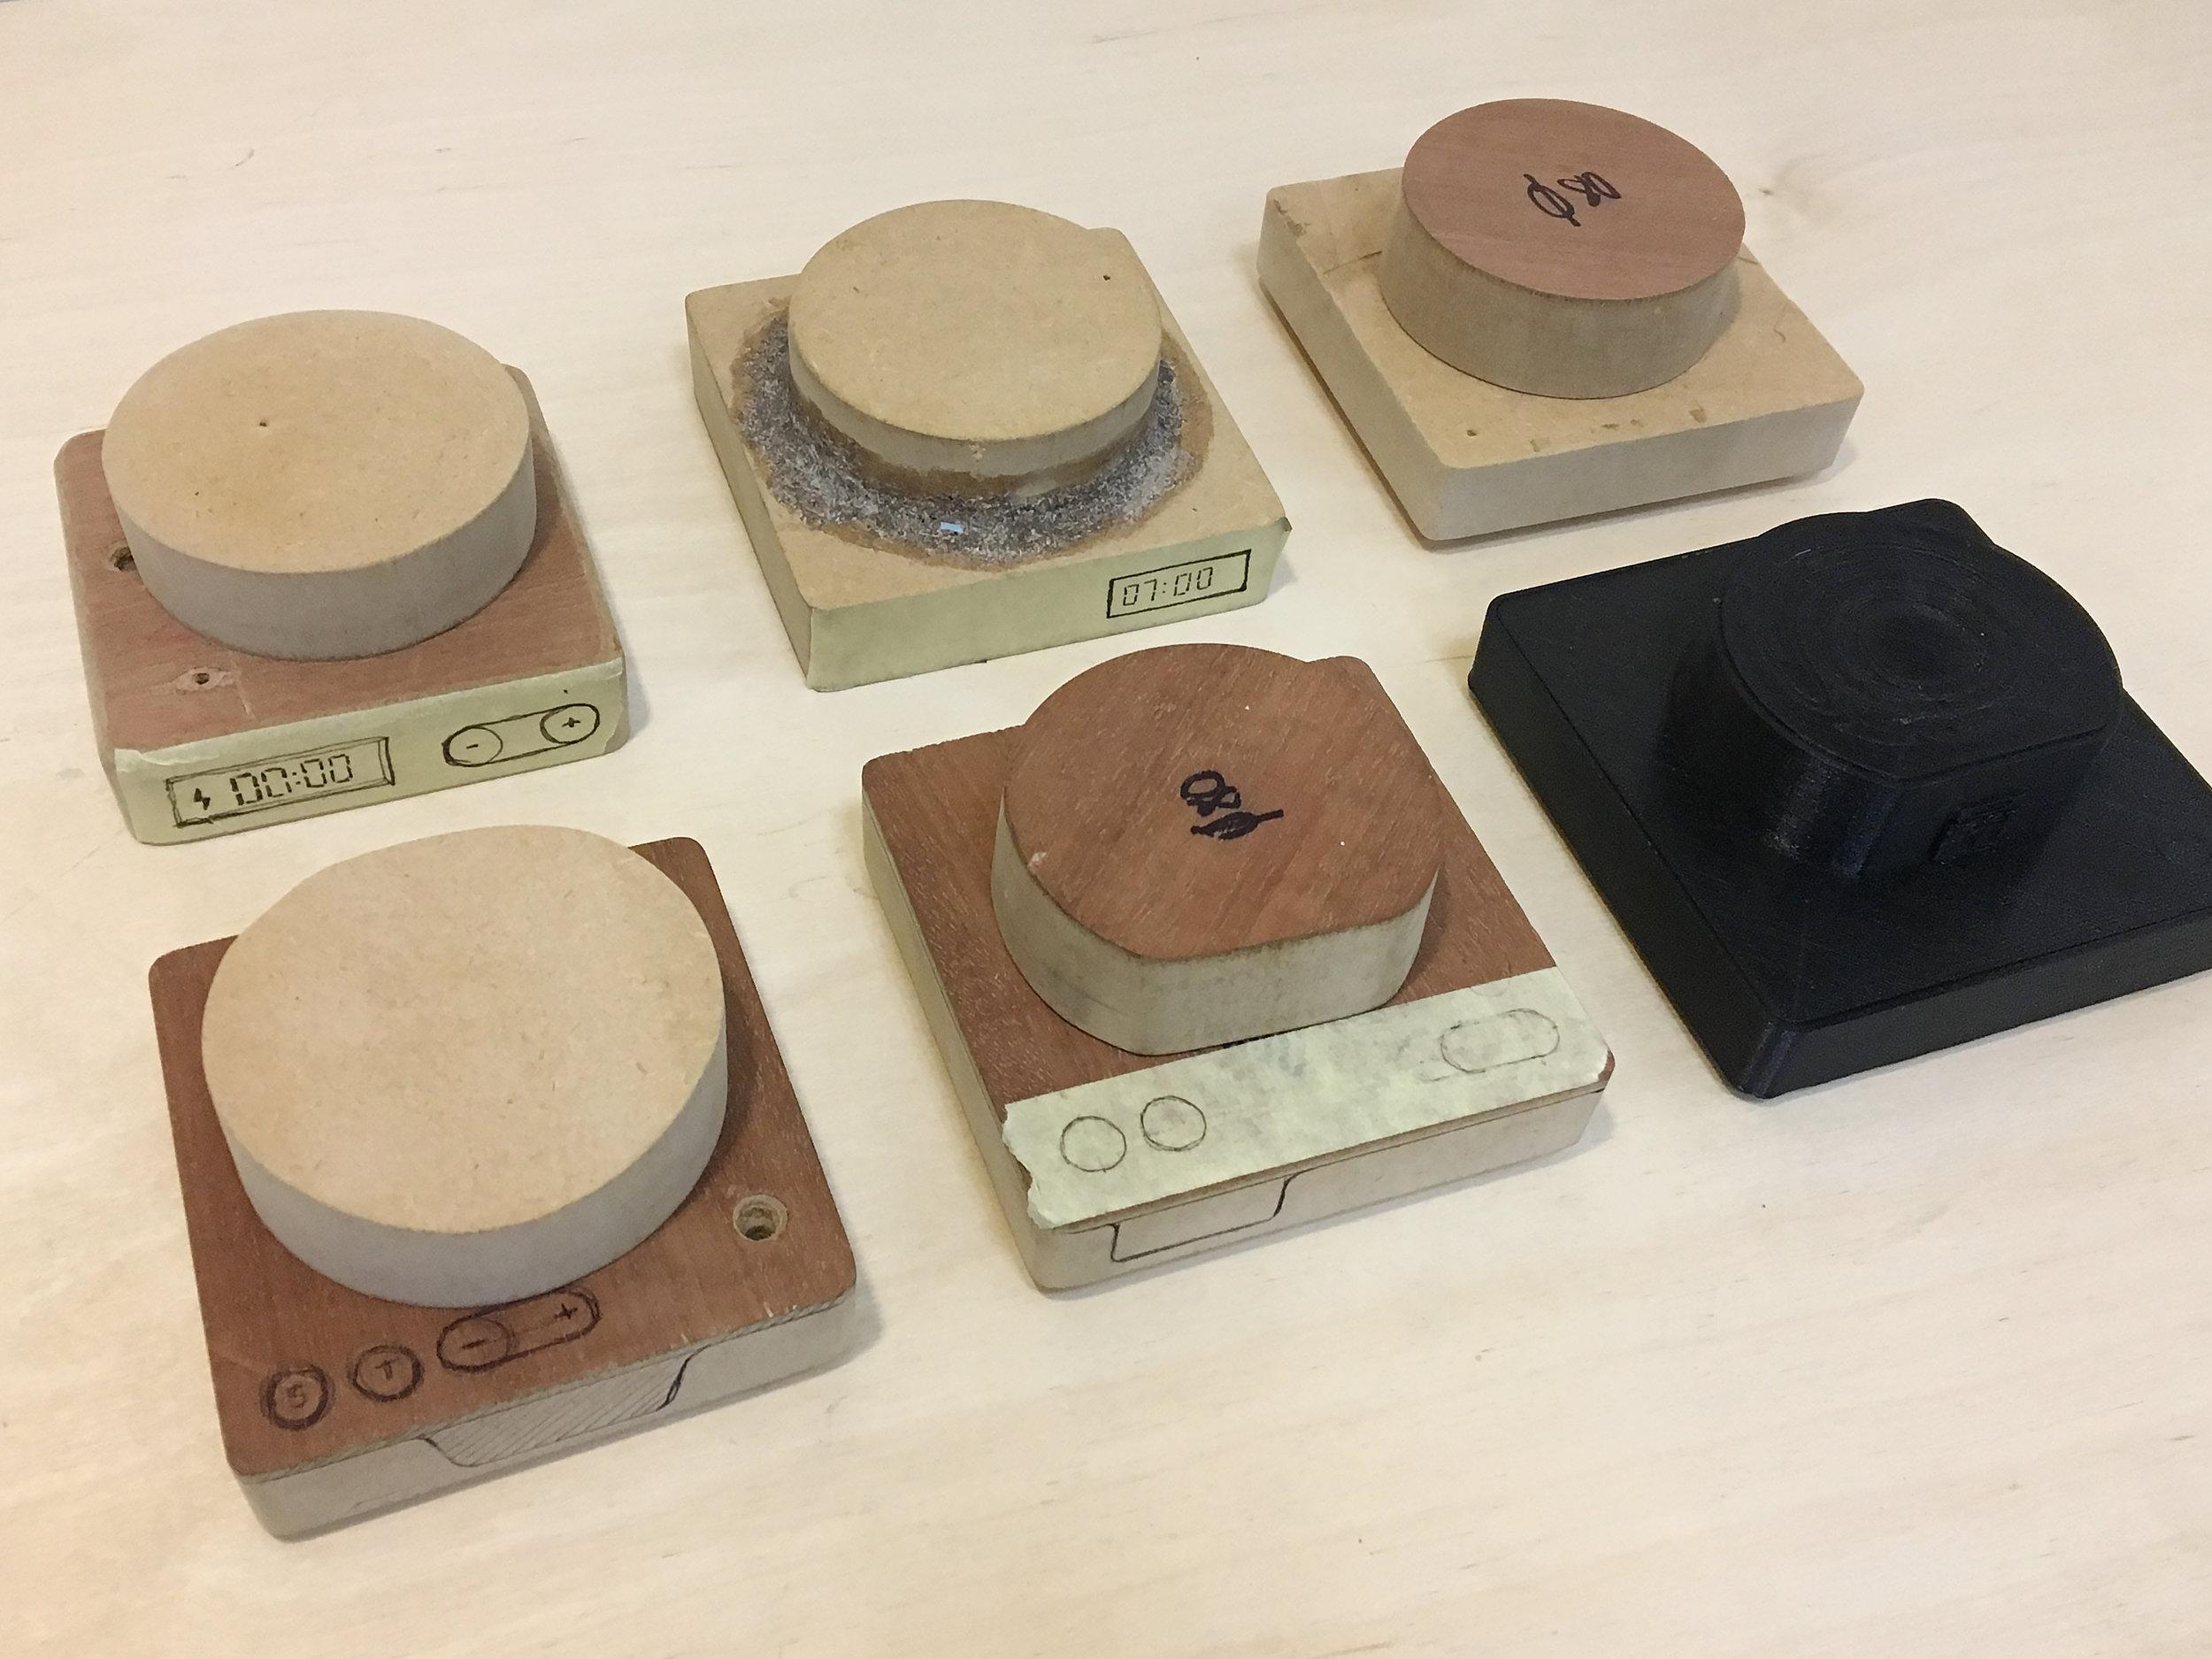 early concept models of alarmshock